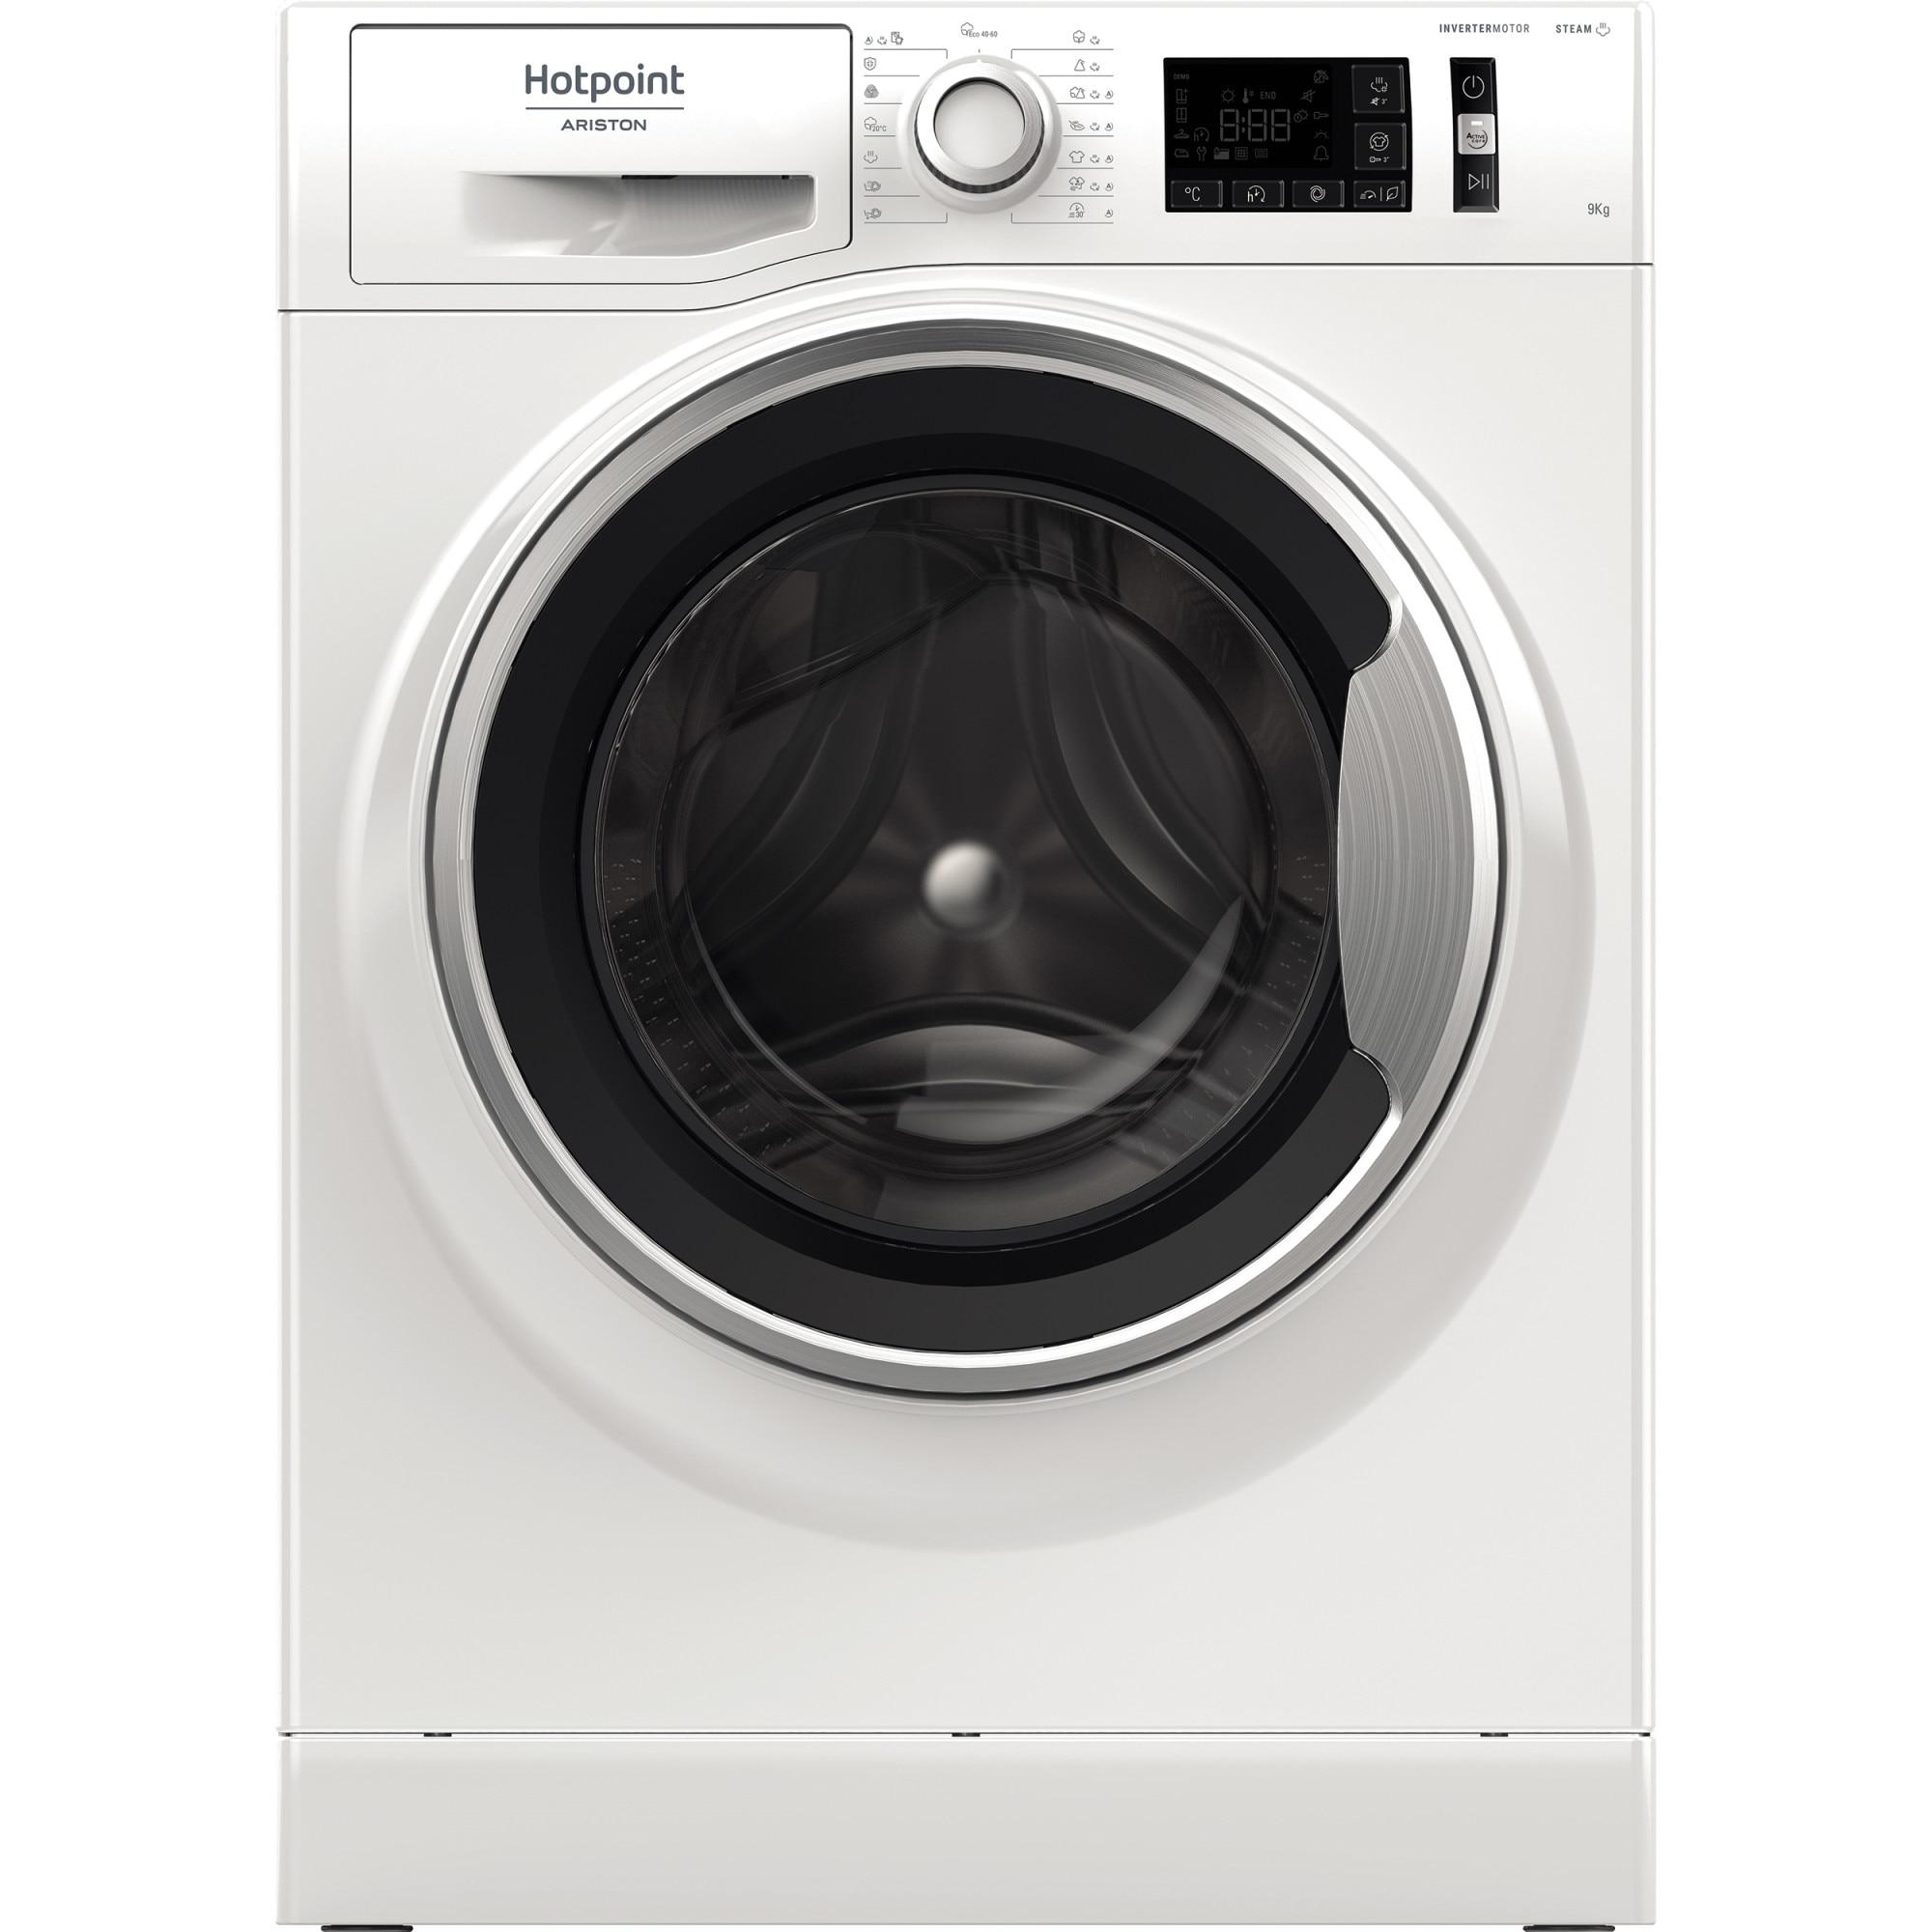 Fotografie Masina de spalat rufe Hotpoint NM11945WSAEUN, 9kg, 1400 rpm, Clasa B, Steam Refresh, Steam Hygiene, Motor Inverter, Display Digital, Alb